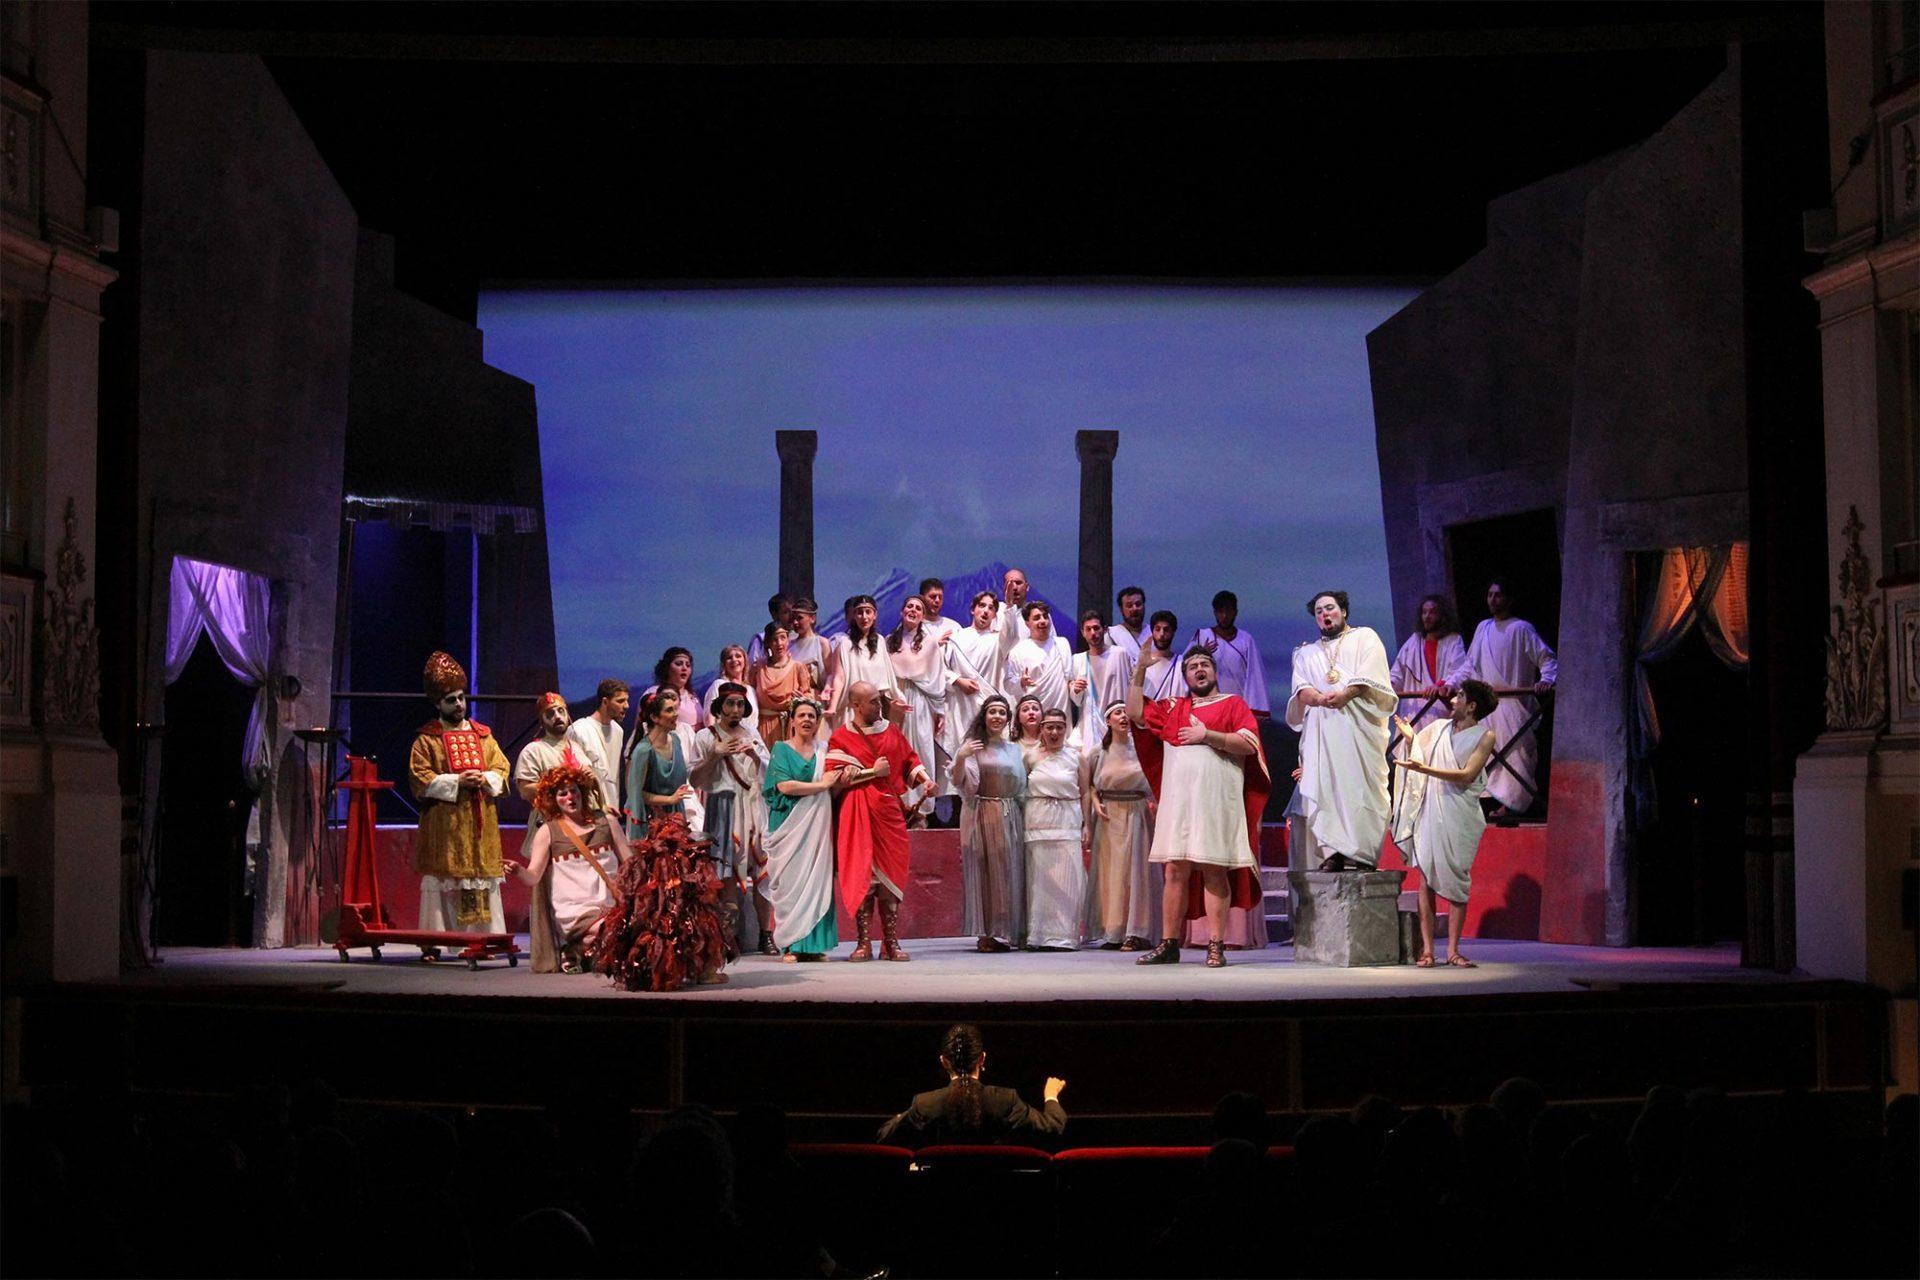 teatro-marrucino-giove-a-pompei-02